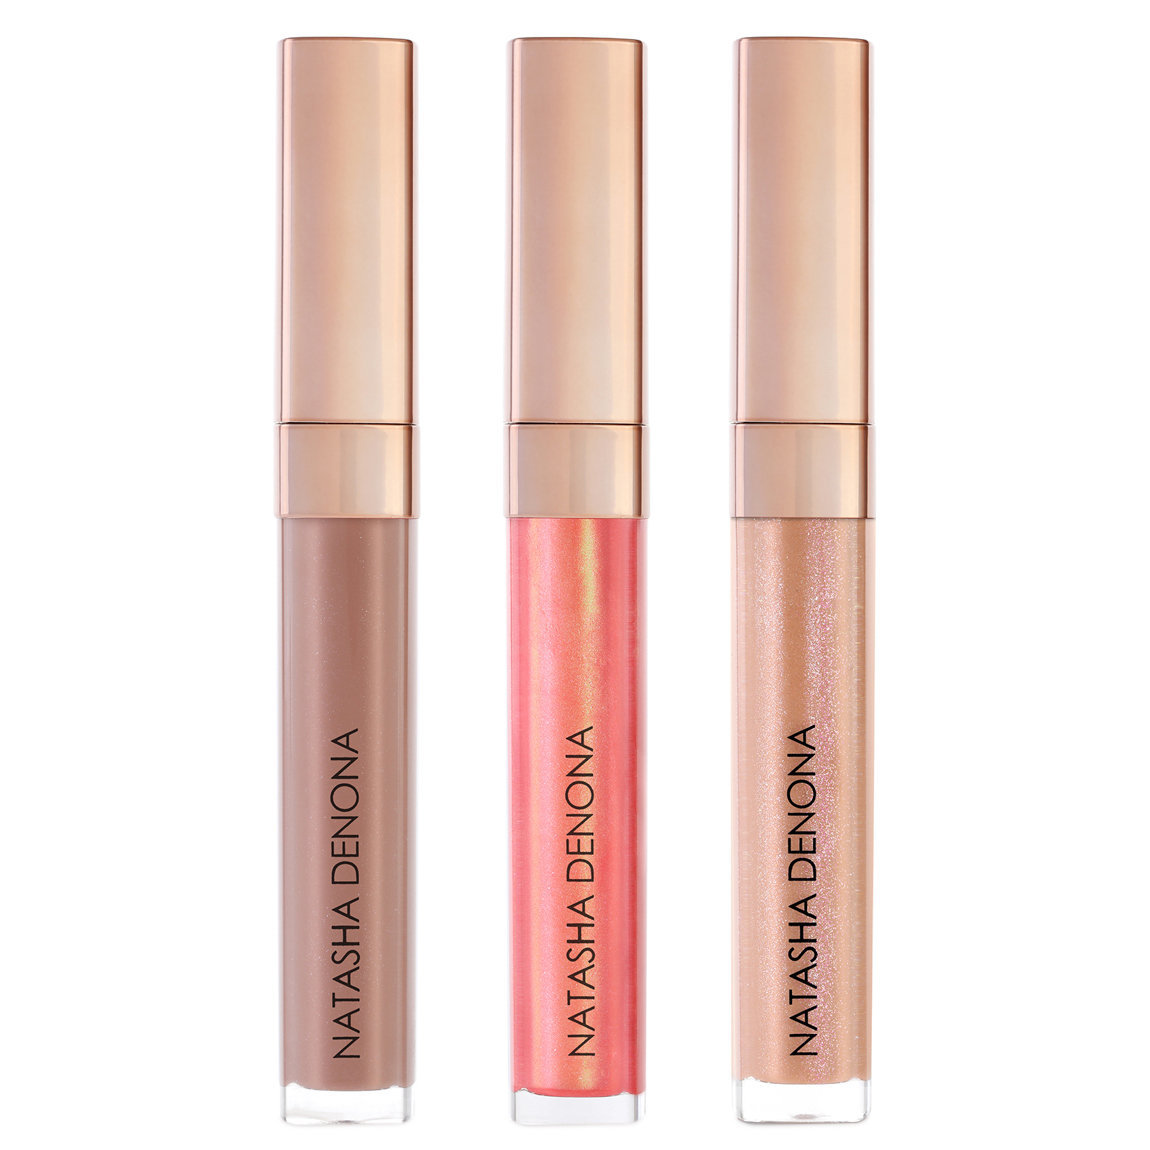 Natasha Denona The Love Story Collection Lip Oh-Phoria Gloss & Balm Bundle alternative view 1 - product swatch.